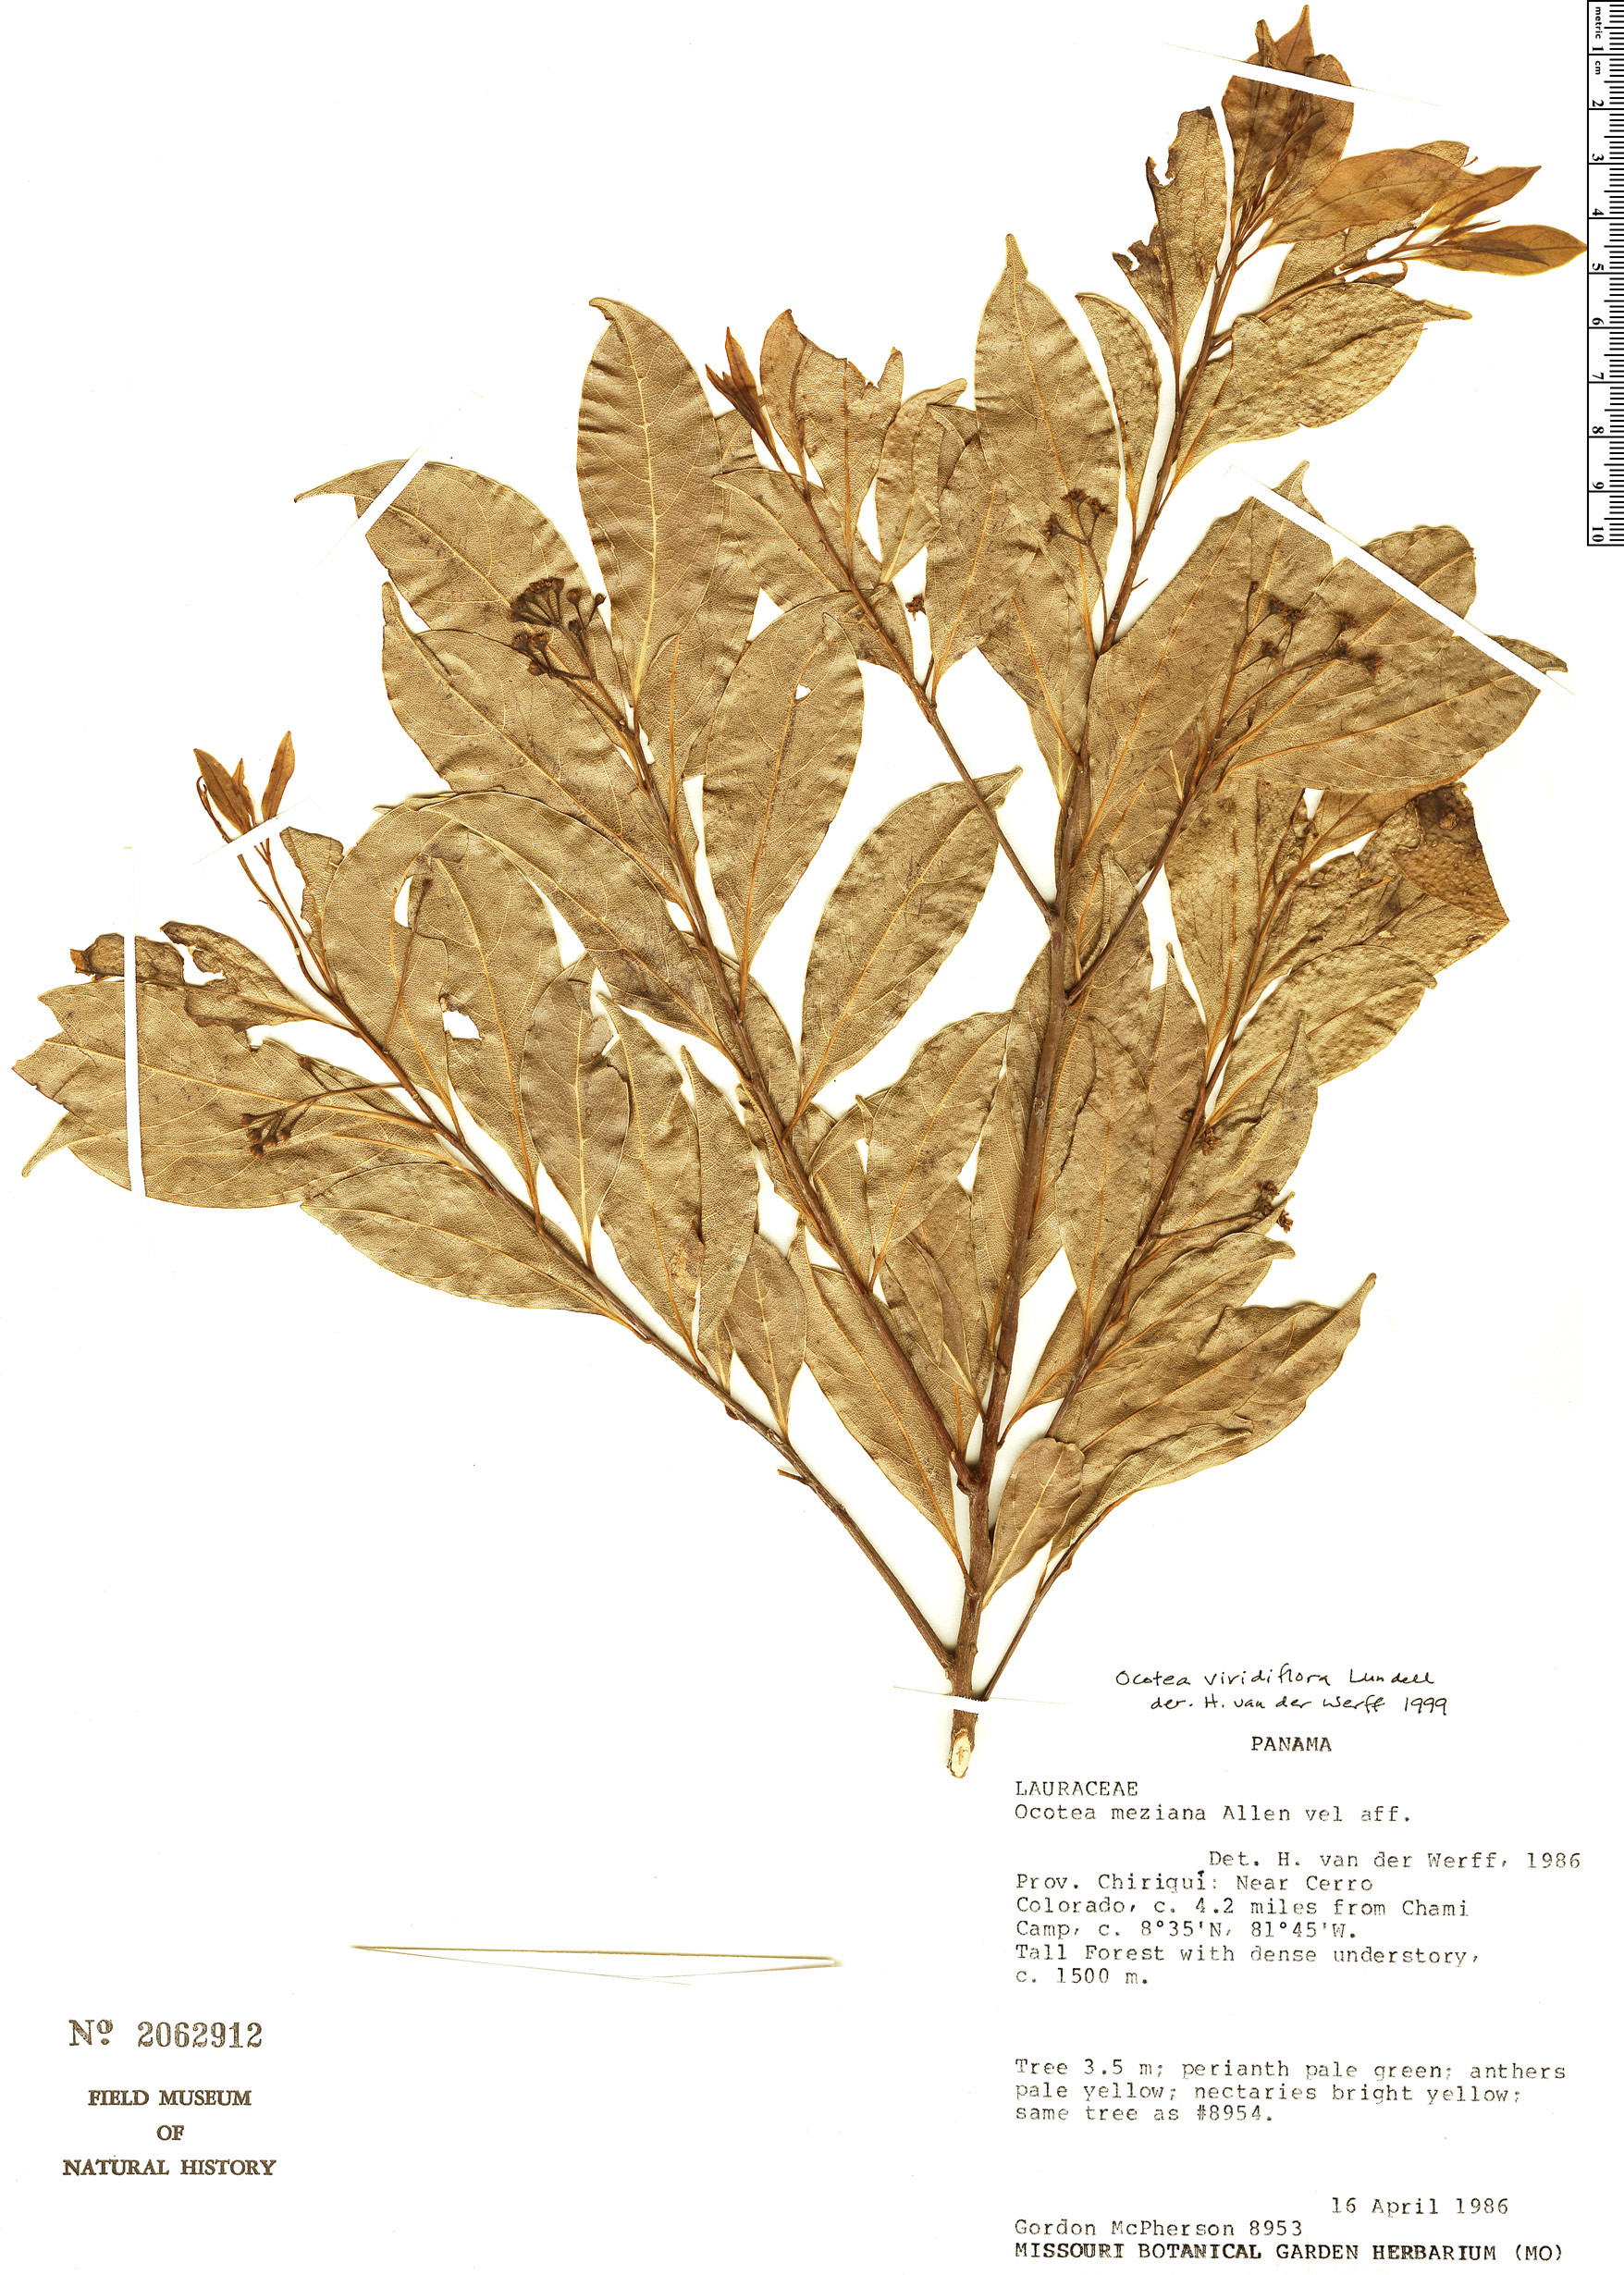 Specimen: Ocotea viridiflora